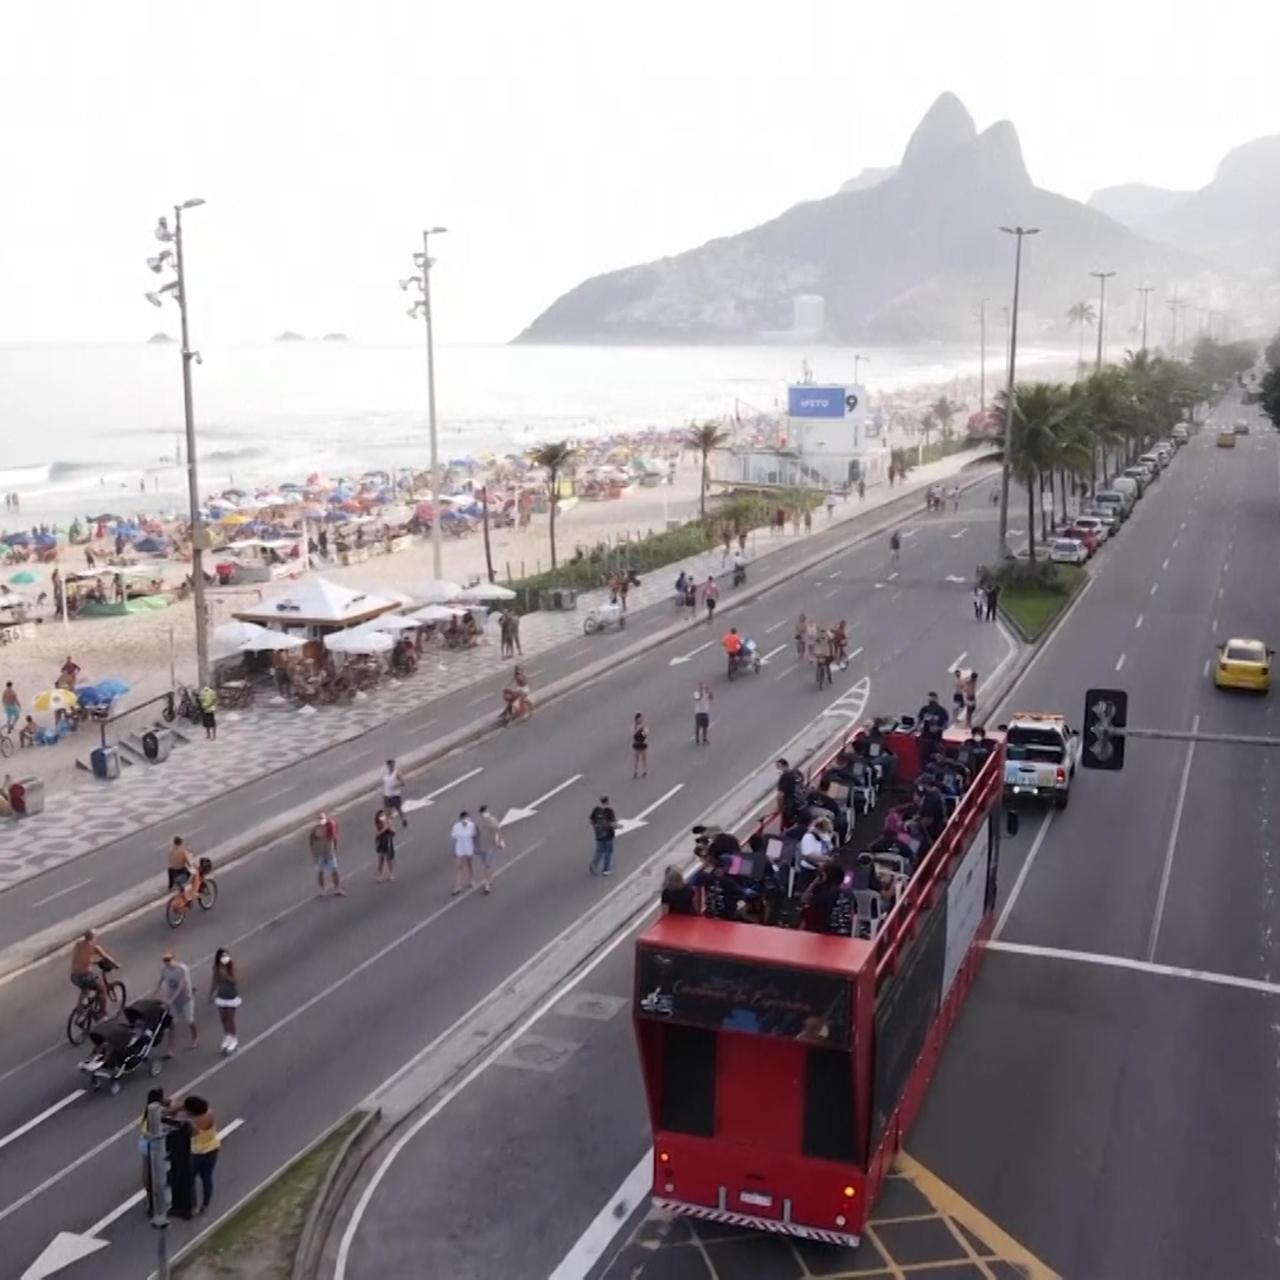 This mobile orchestra serenades the city of Rio de Janeiro